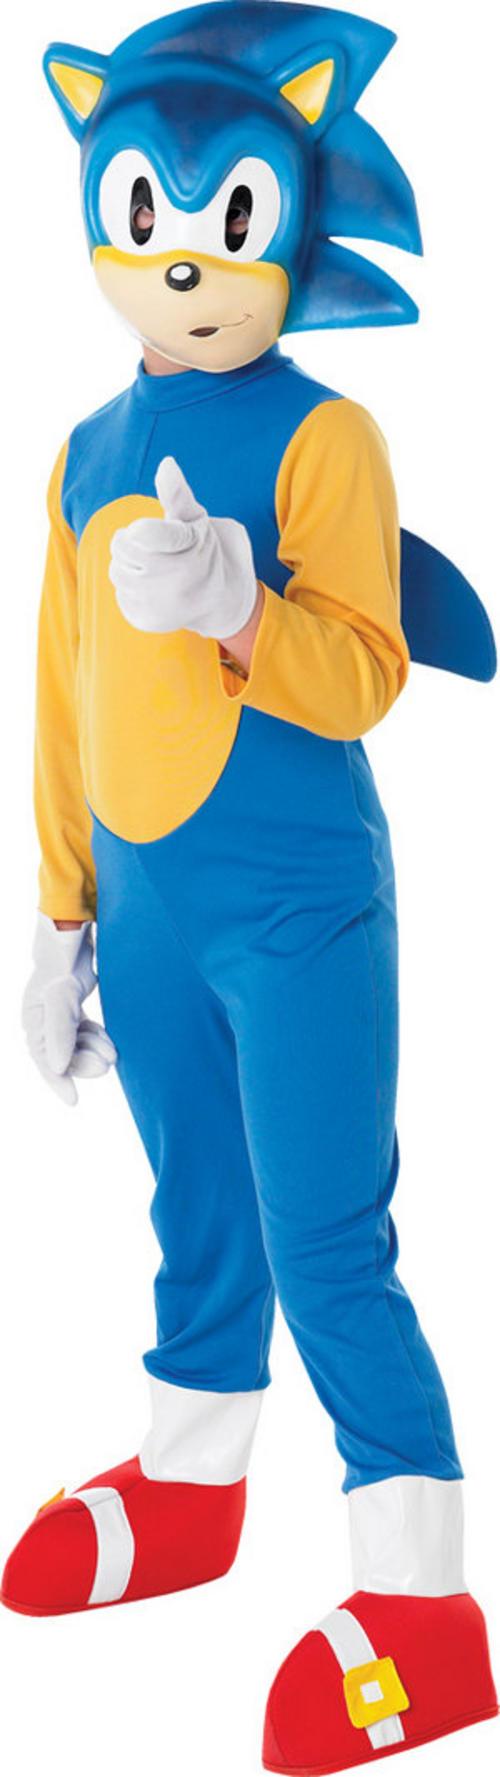 Sonic The Hedgehog Halloween Costume